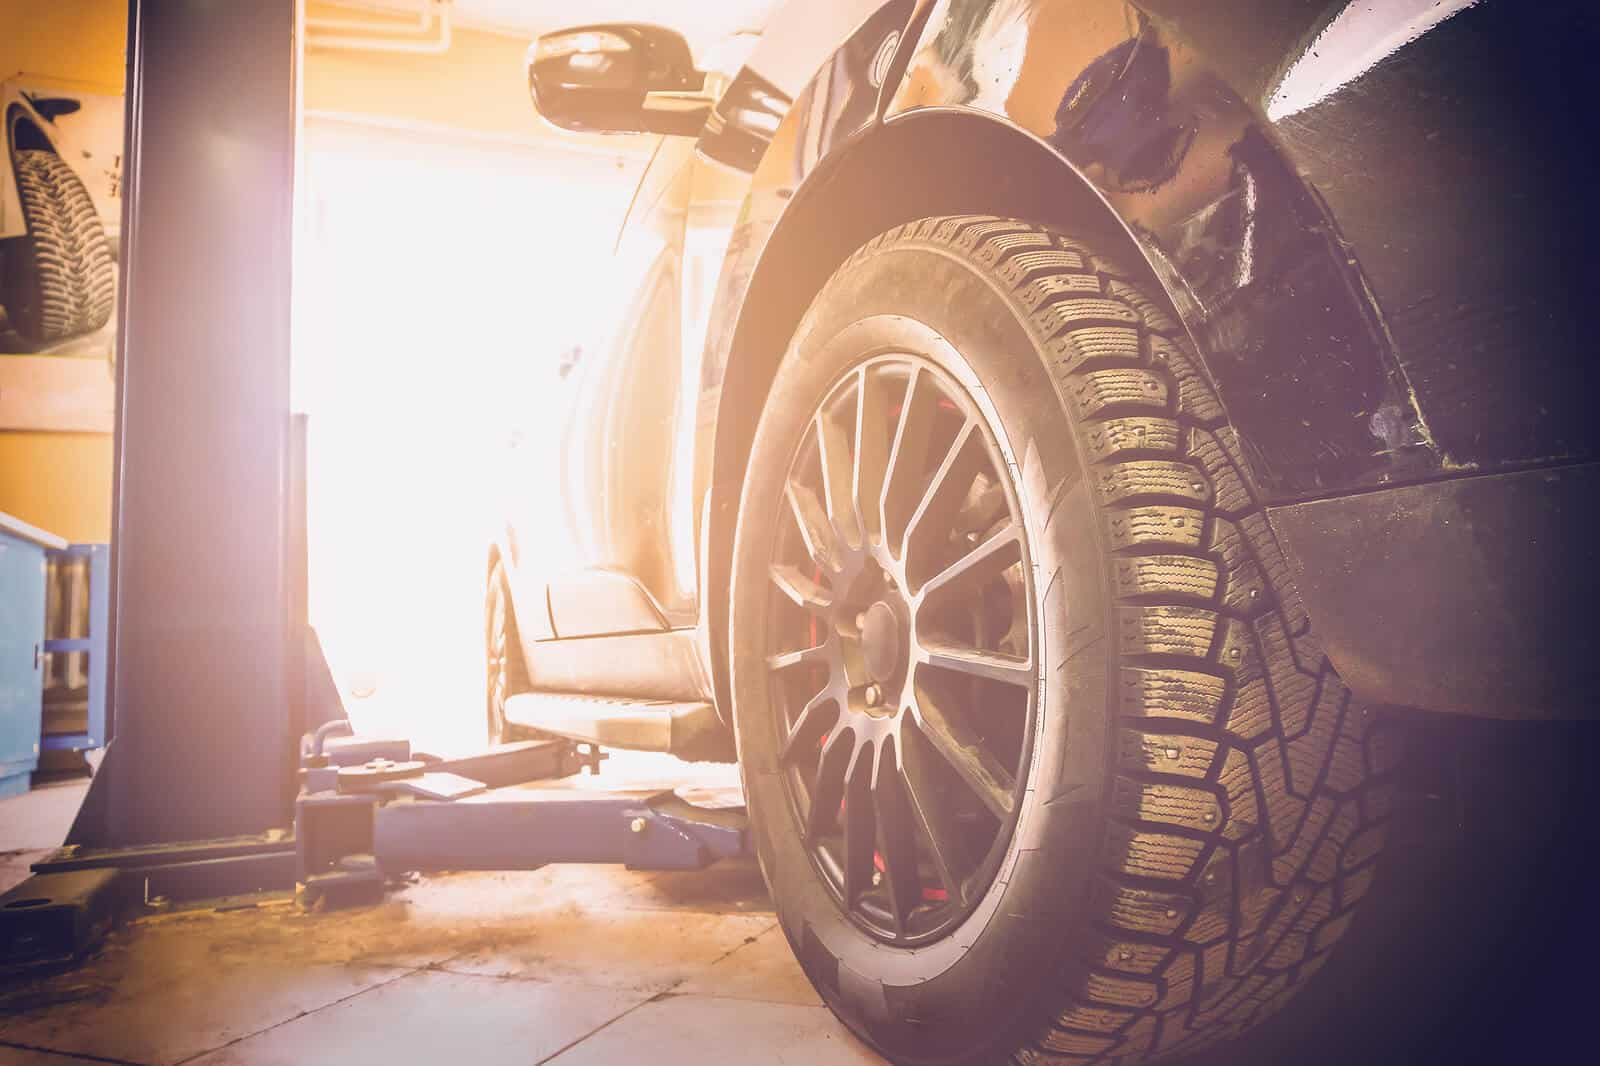 Car in mechanics garage